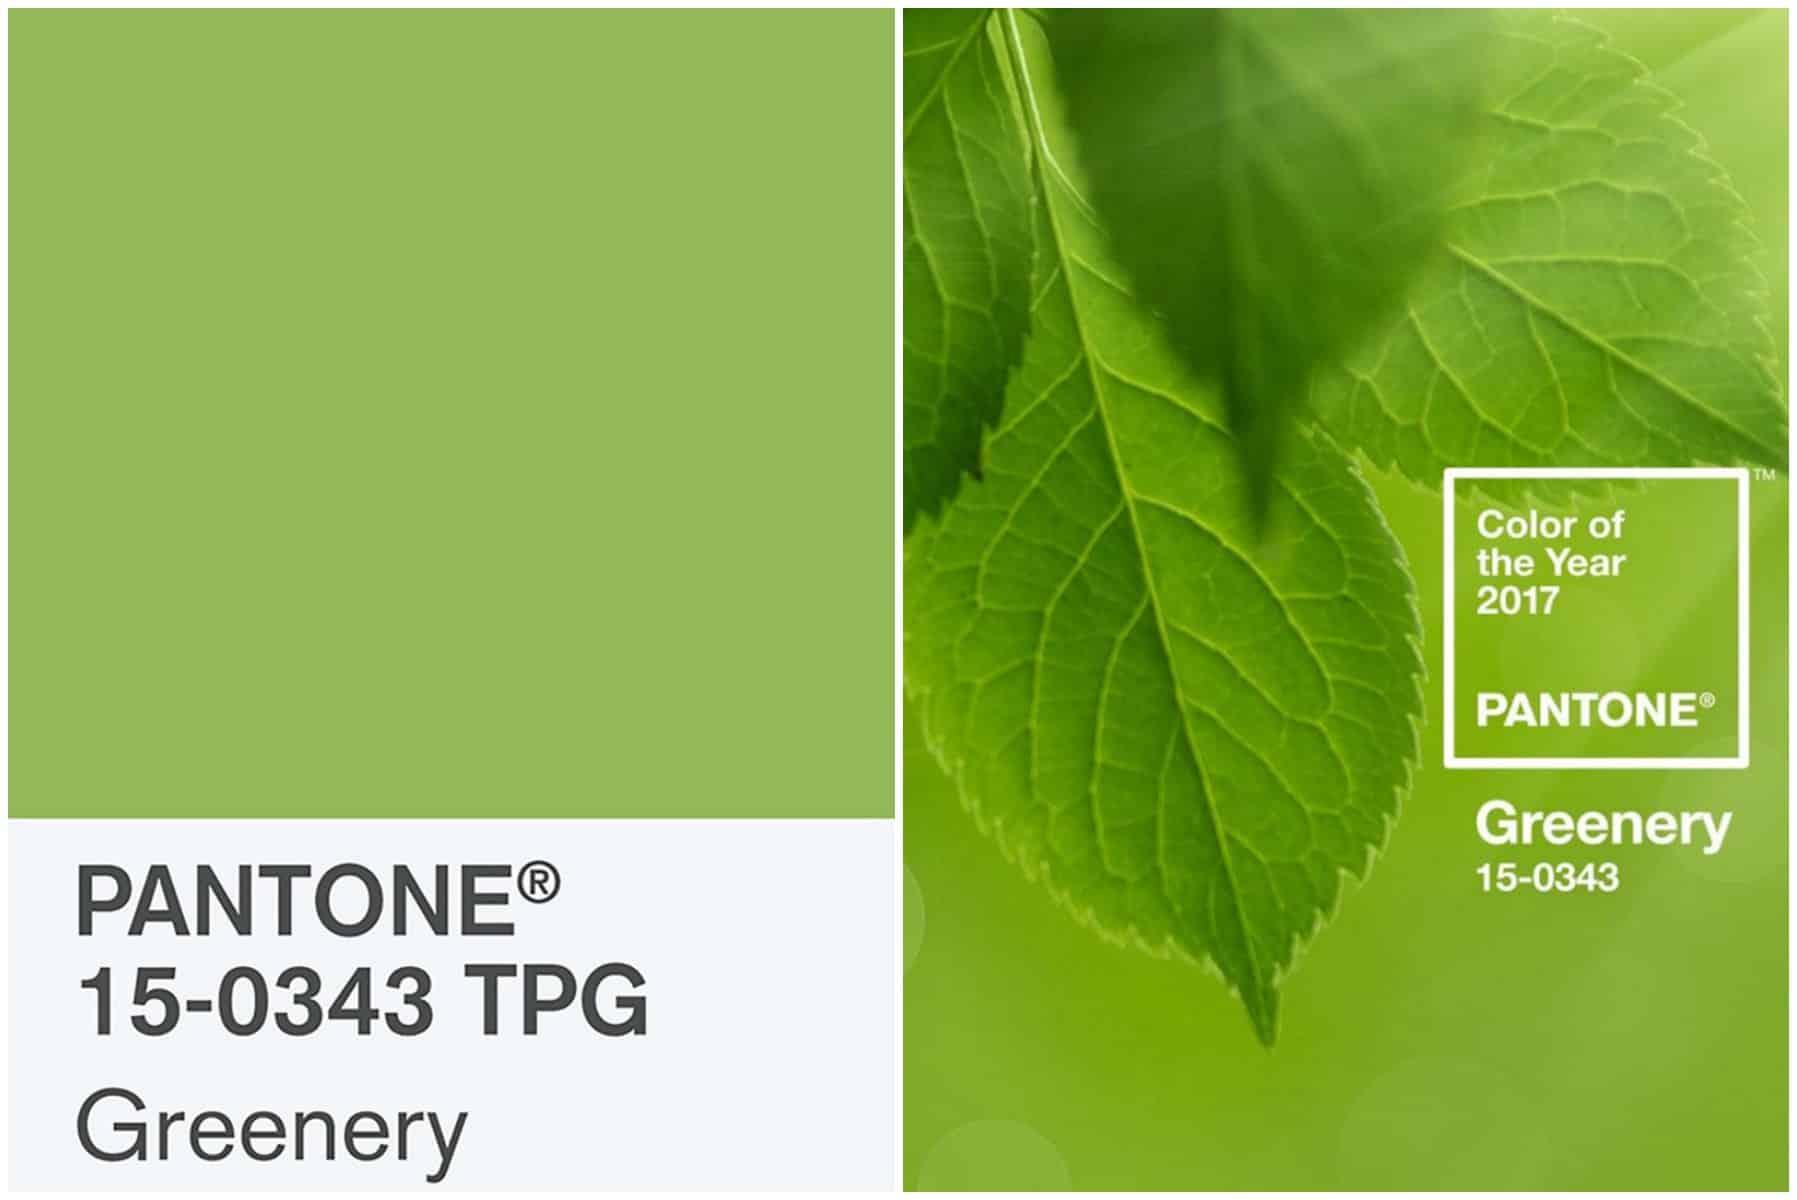 Pantone il 2017 sar greenery arscity for Verde pantone 2017